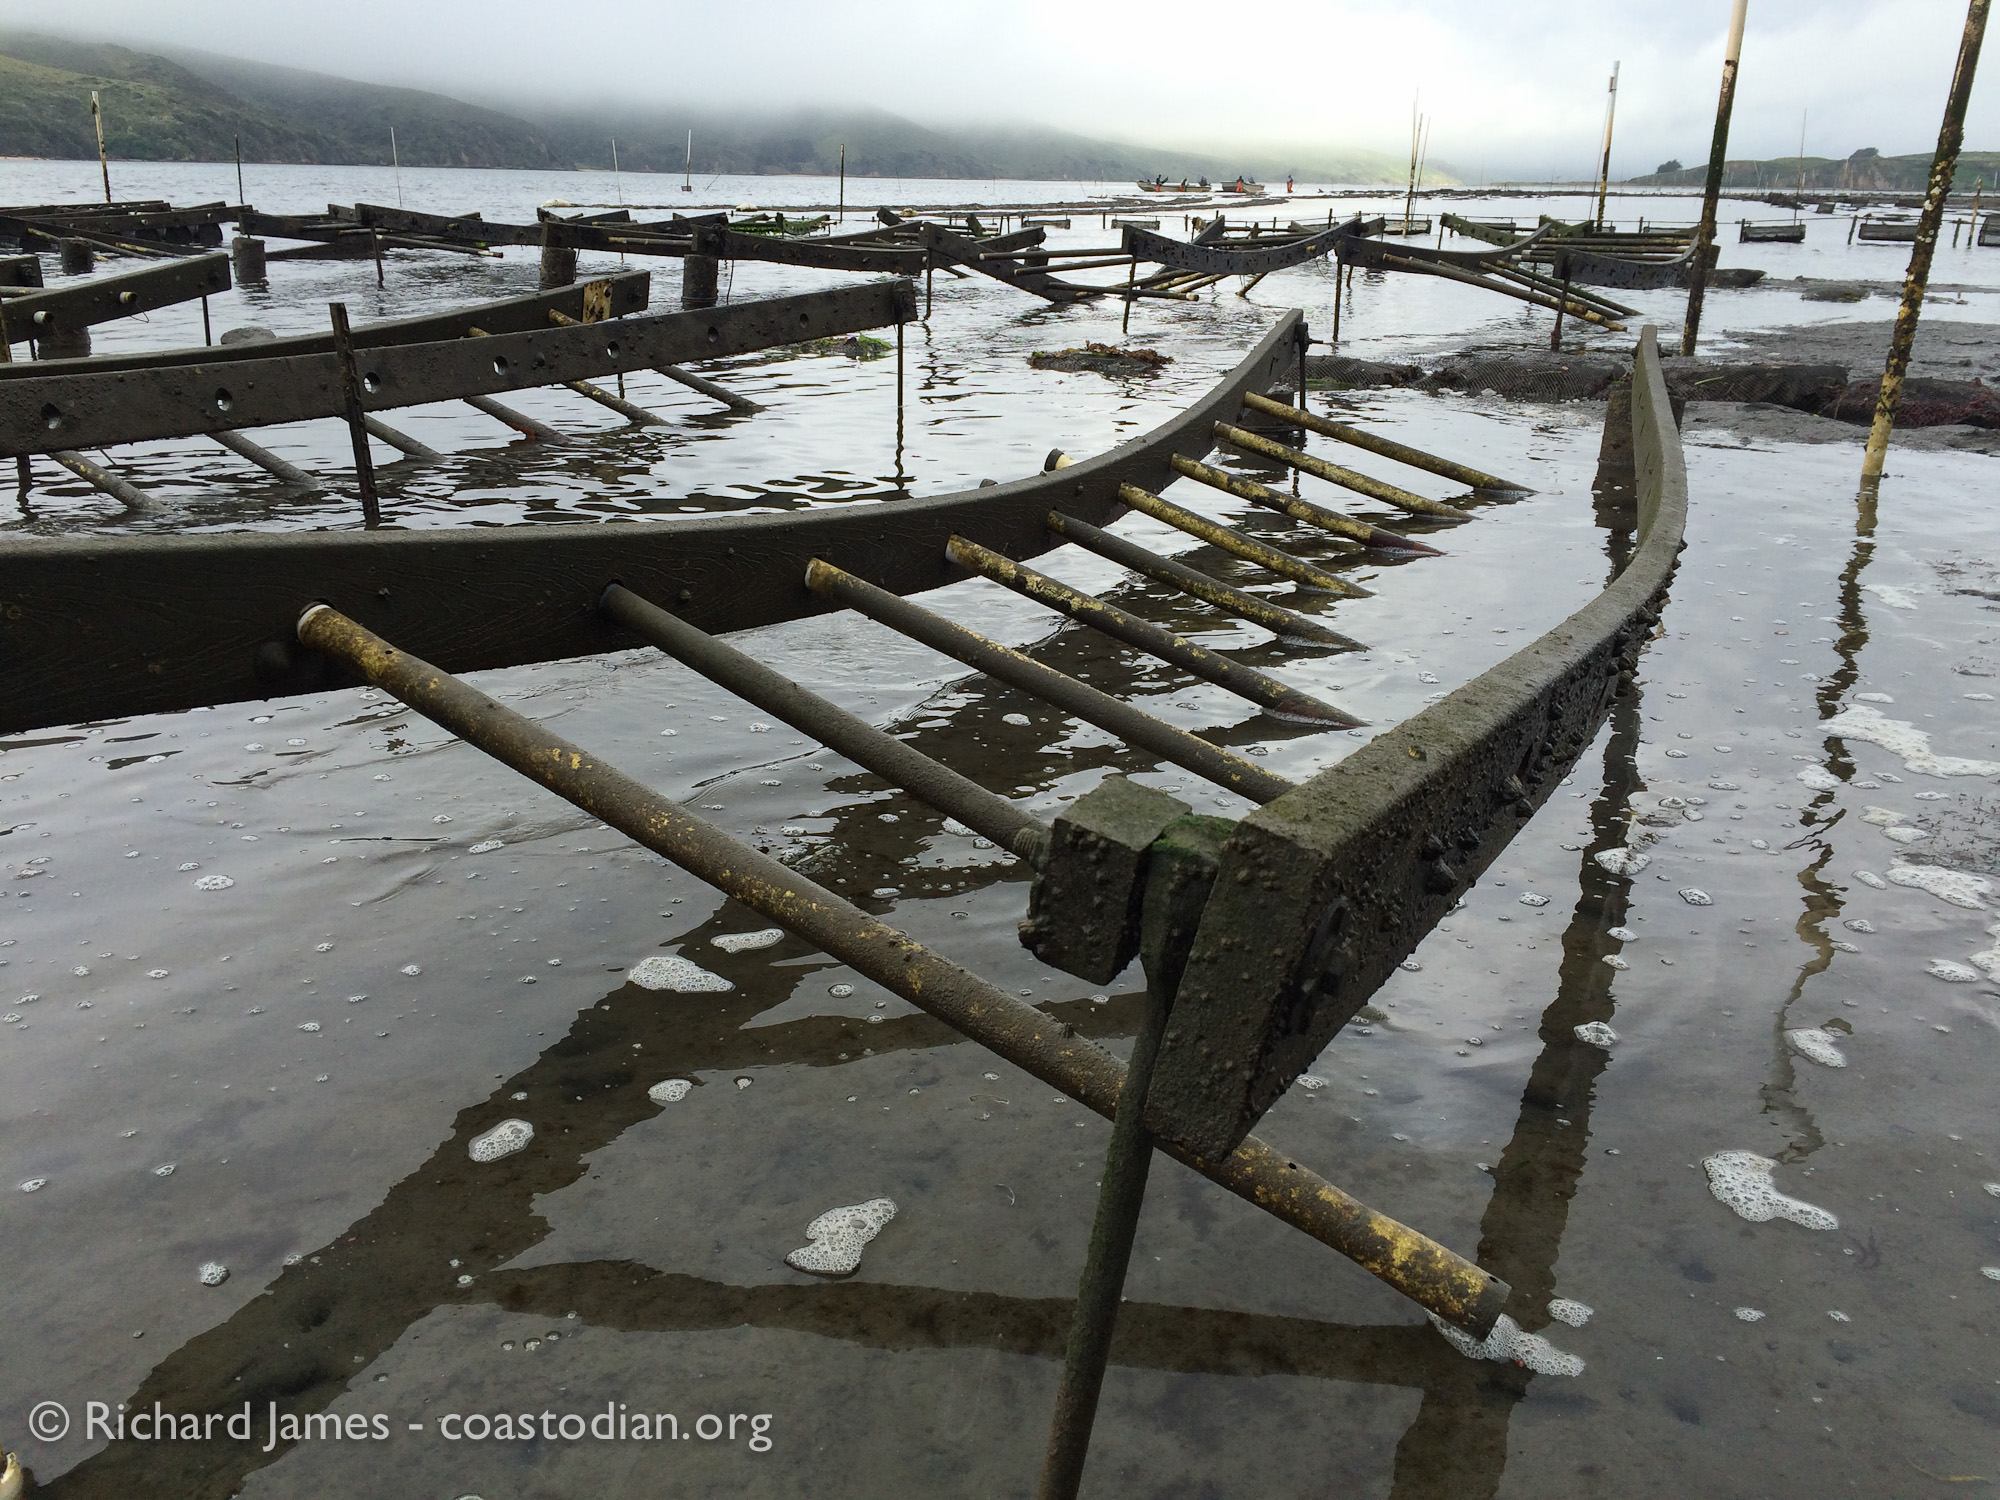 ©Richard James - coastodian.org Stanway oyster racks on Hog Island Oysters lease M-430-10 on 22 March, 2015